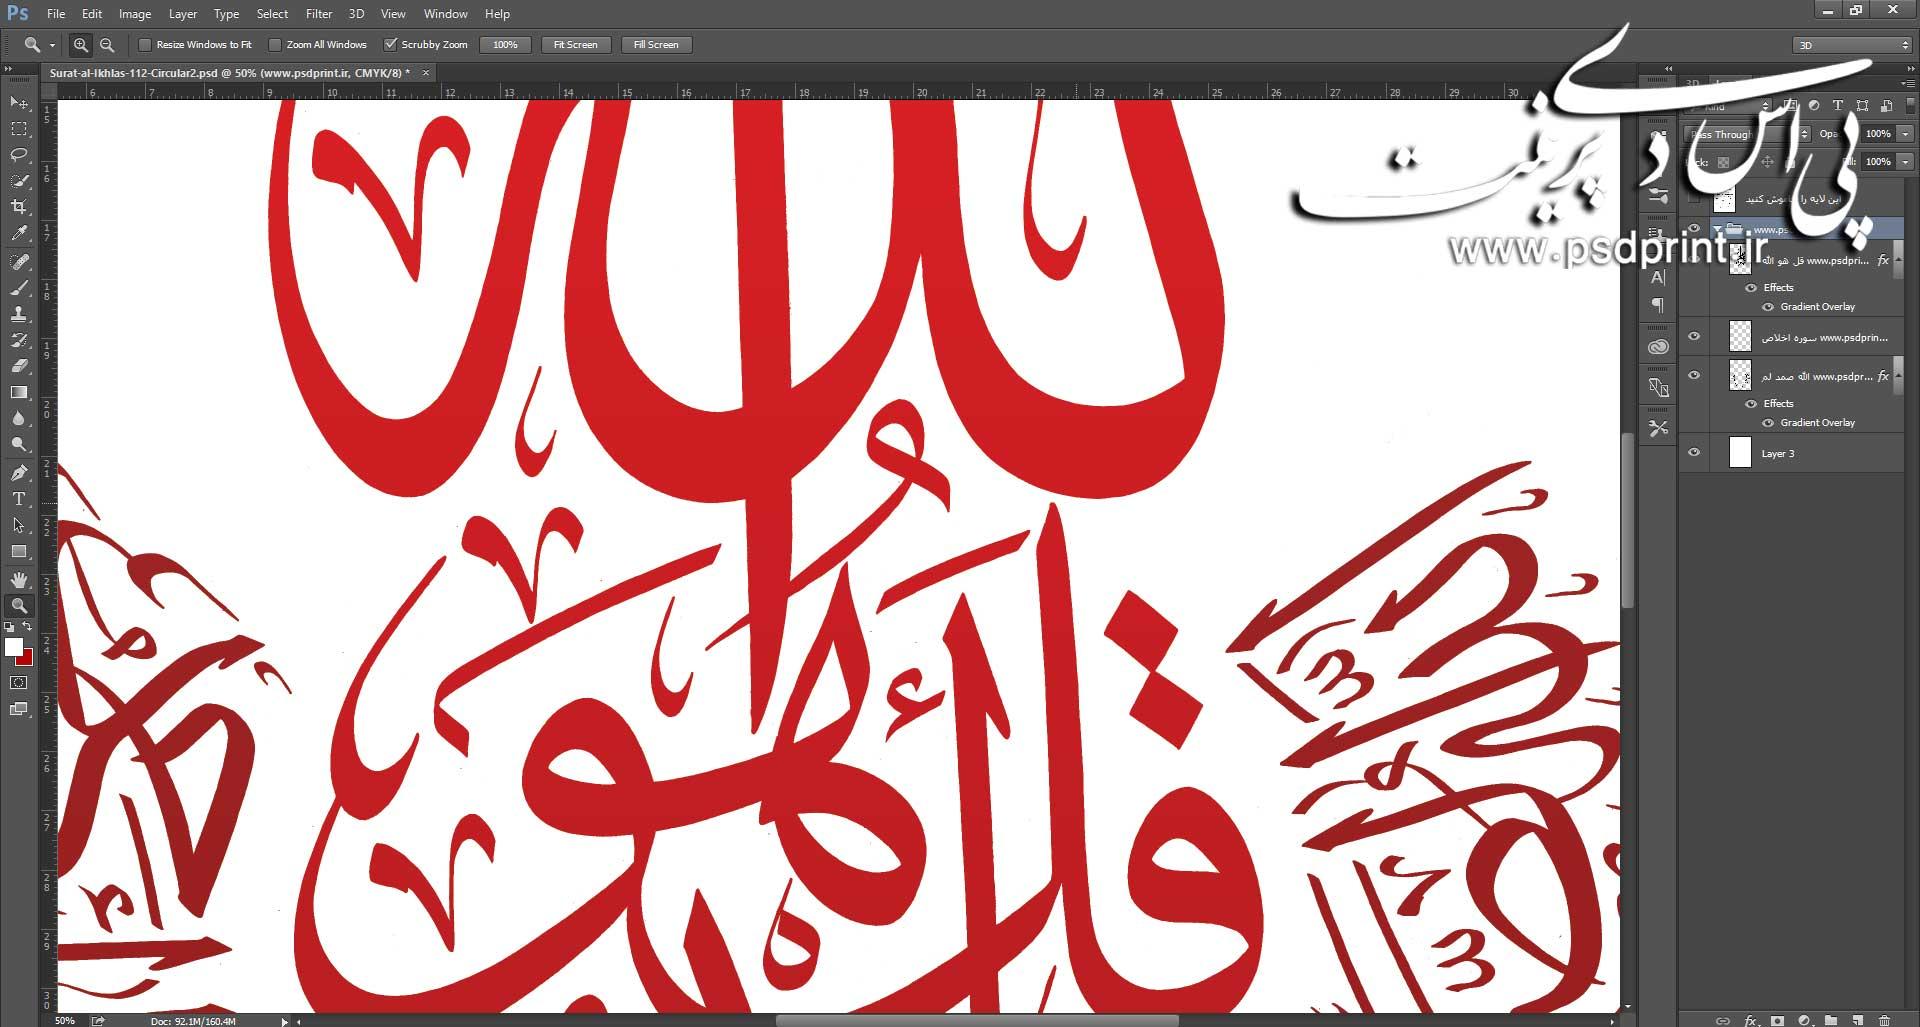 تایپوگرافی سوره اخلاص یا قل هو الله احد